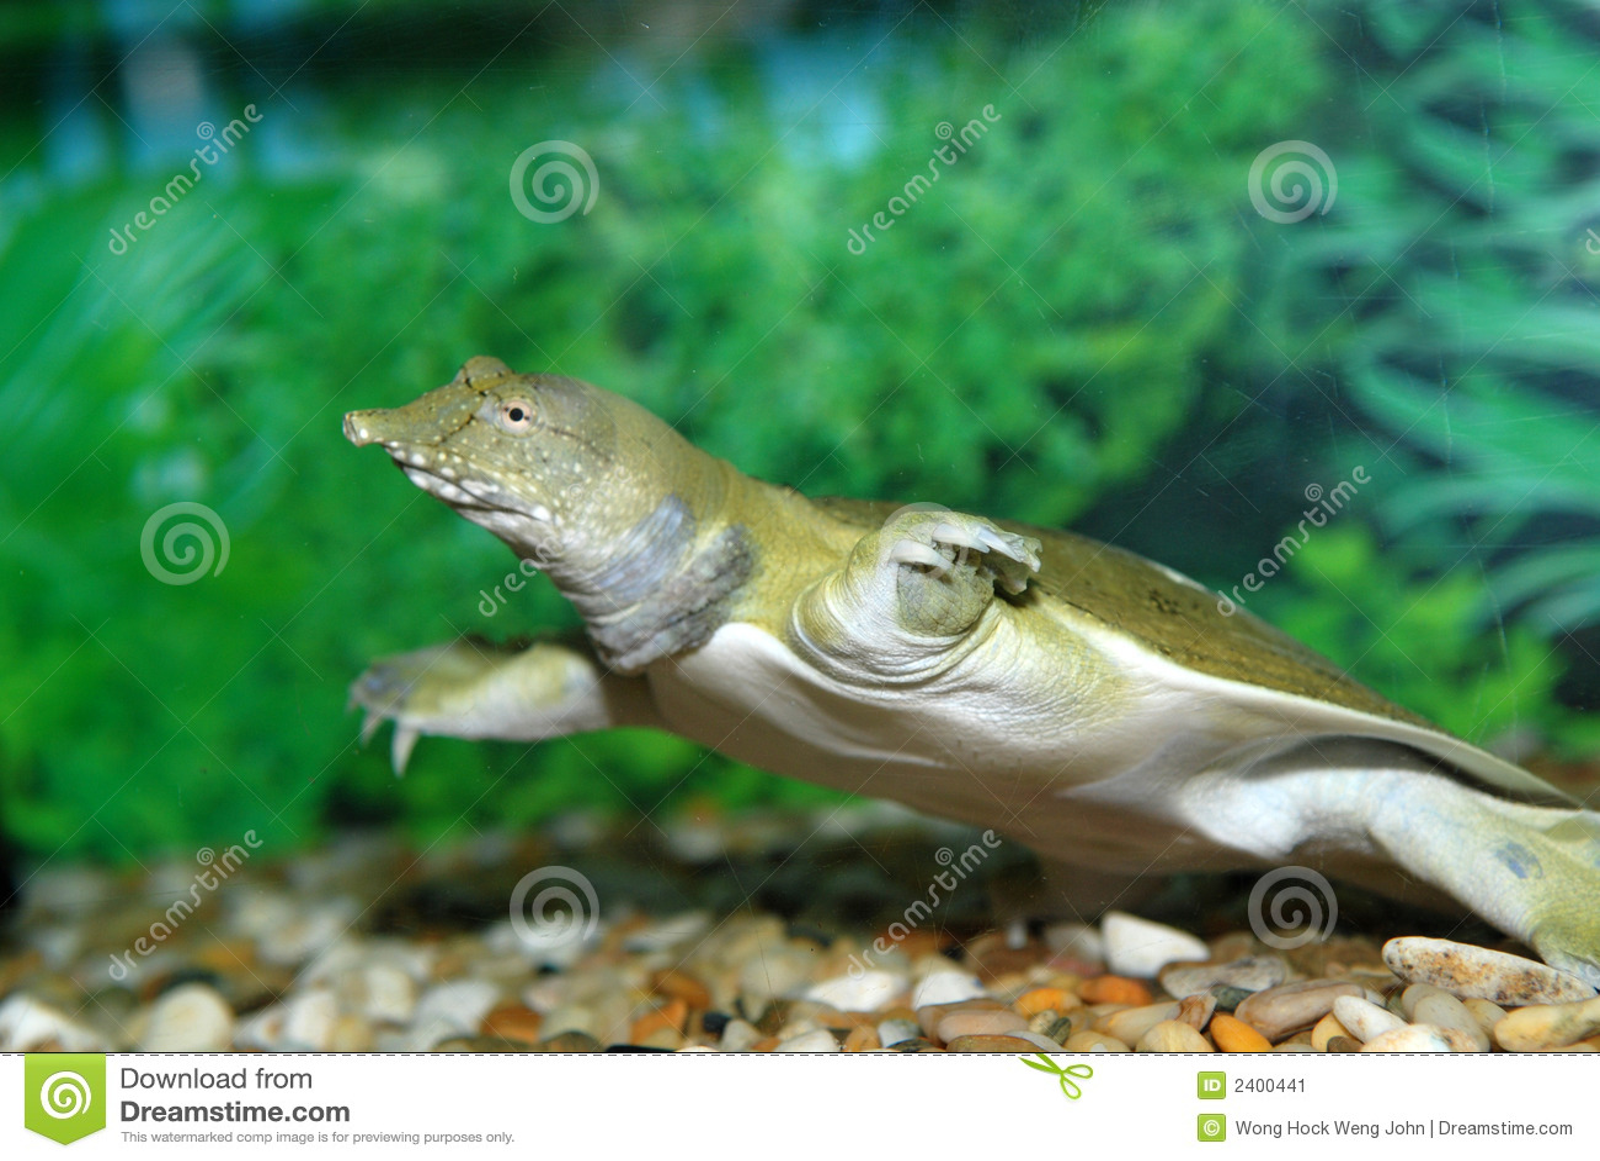 Water Tortoise Stock Image - Image: 2400441